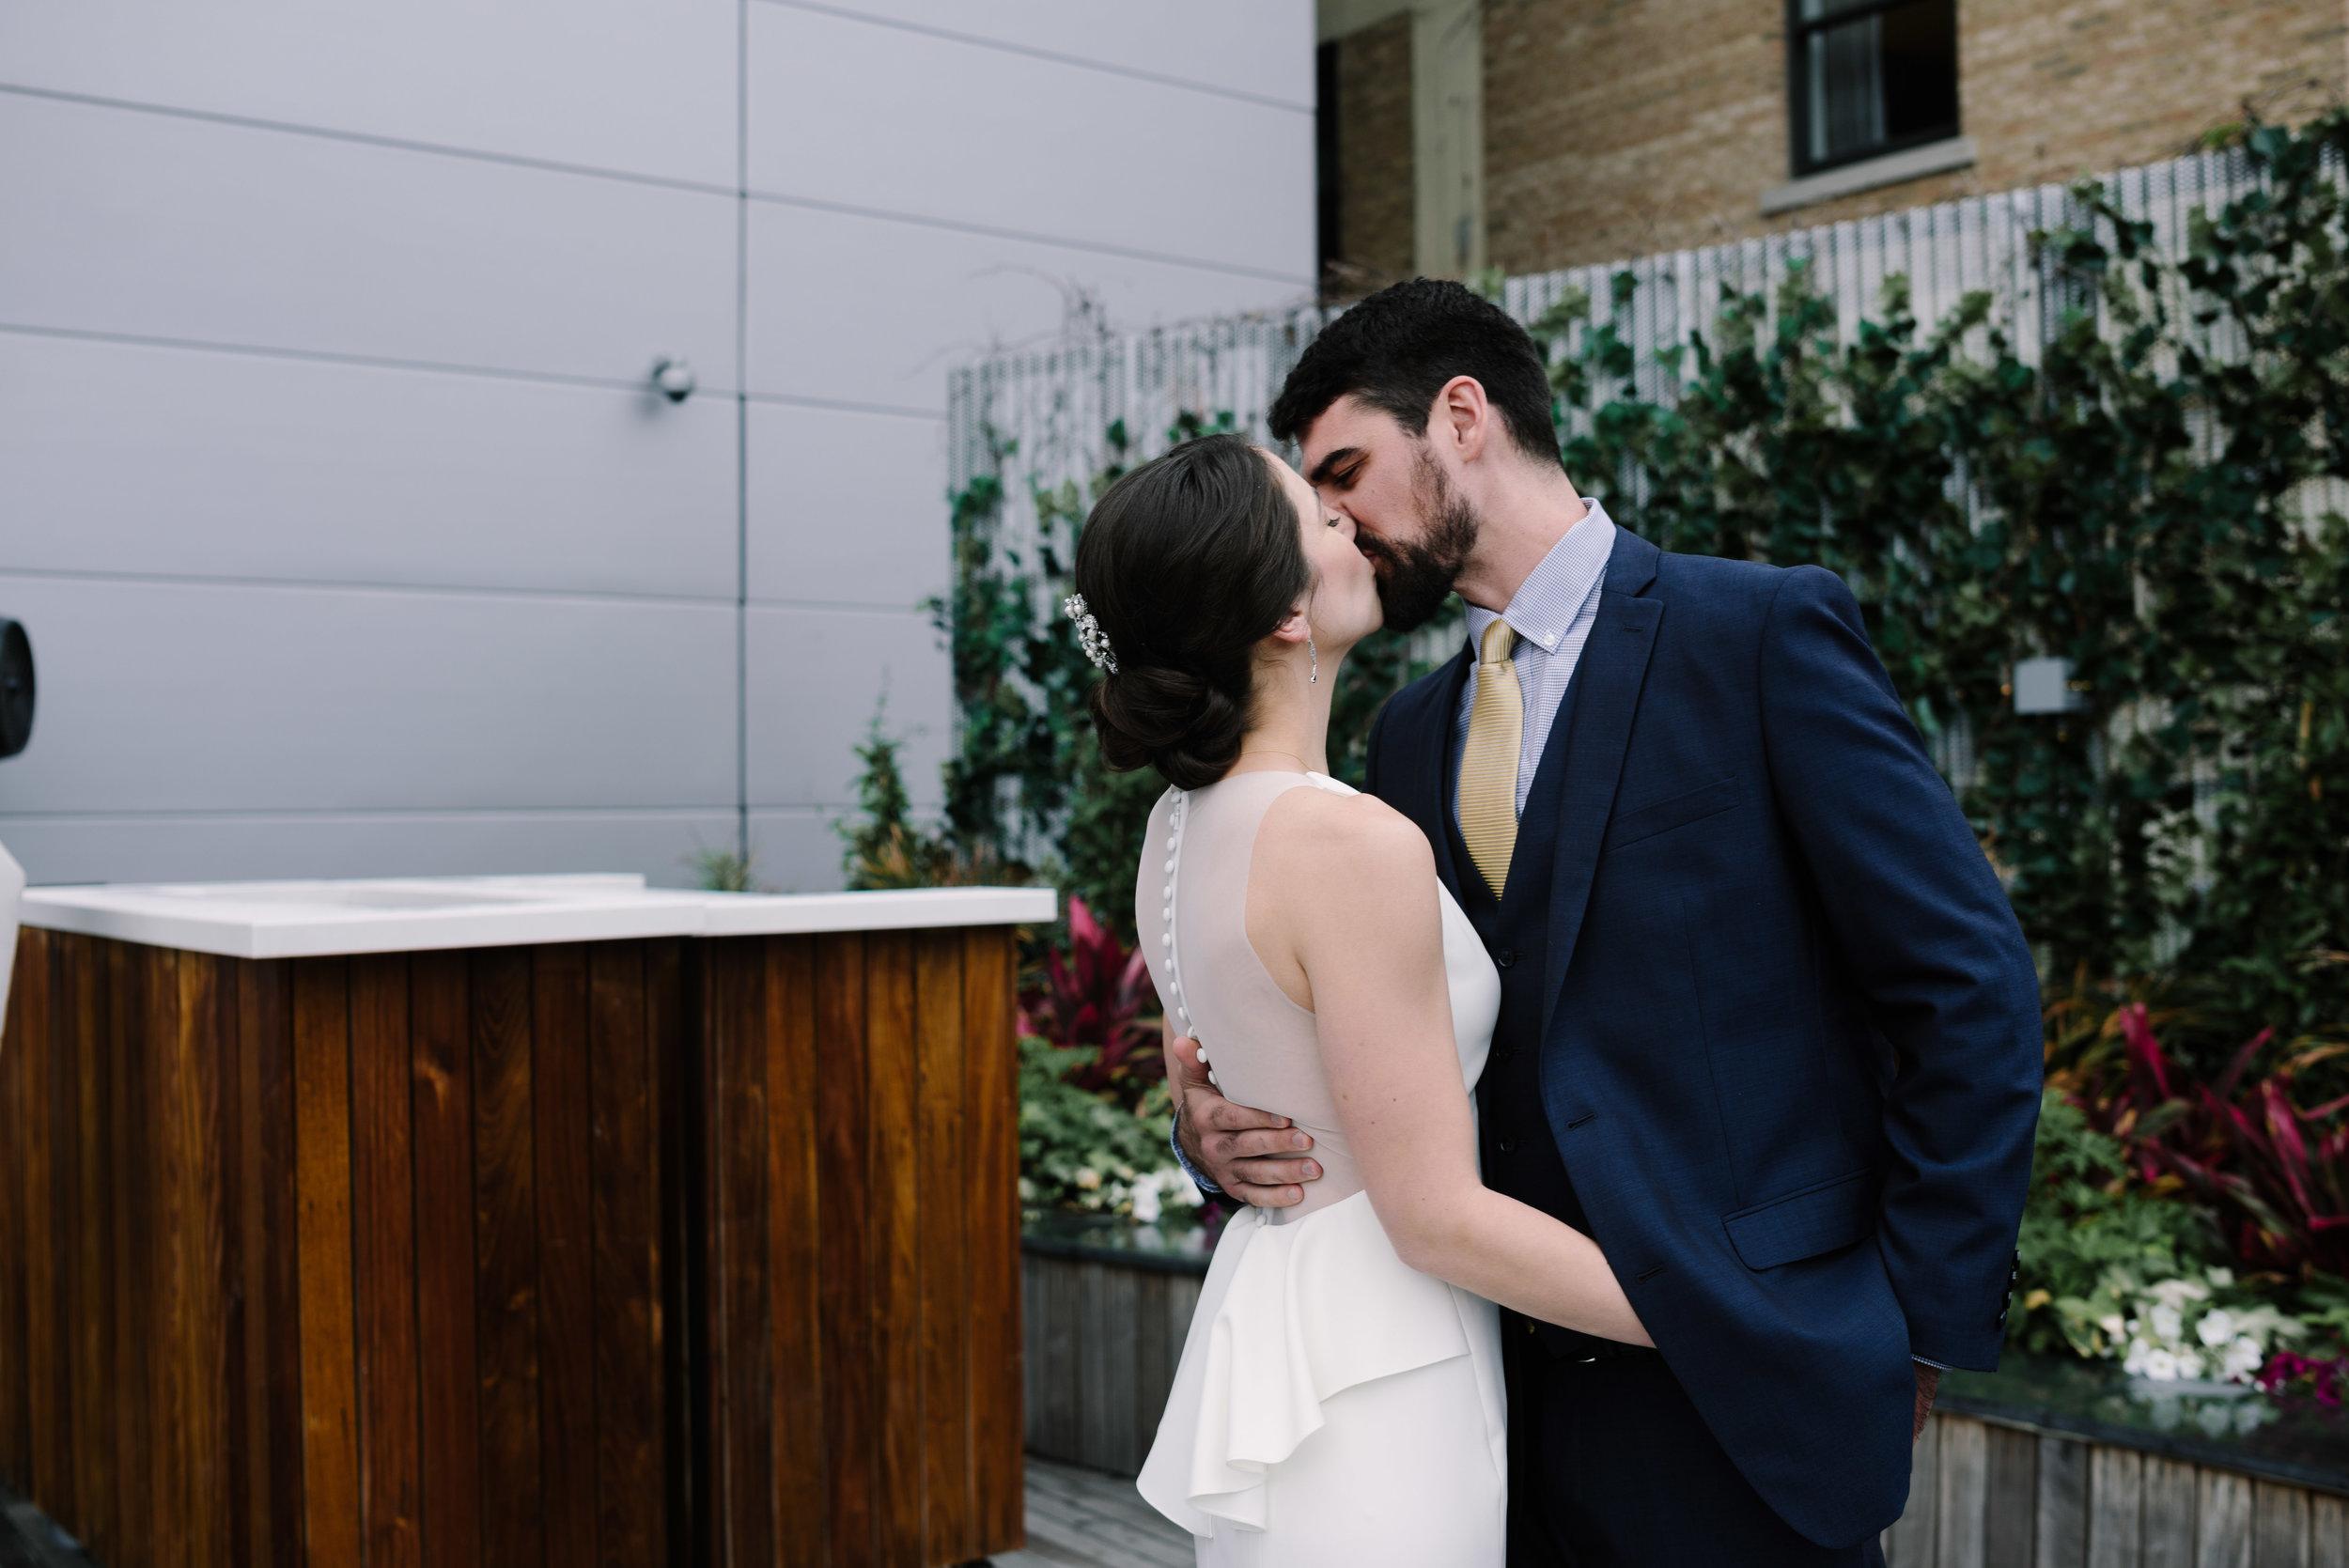 Patricia-Steve-Blog-Indianapolis-Wedding-28.jpg